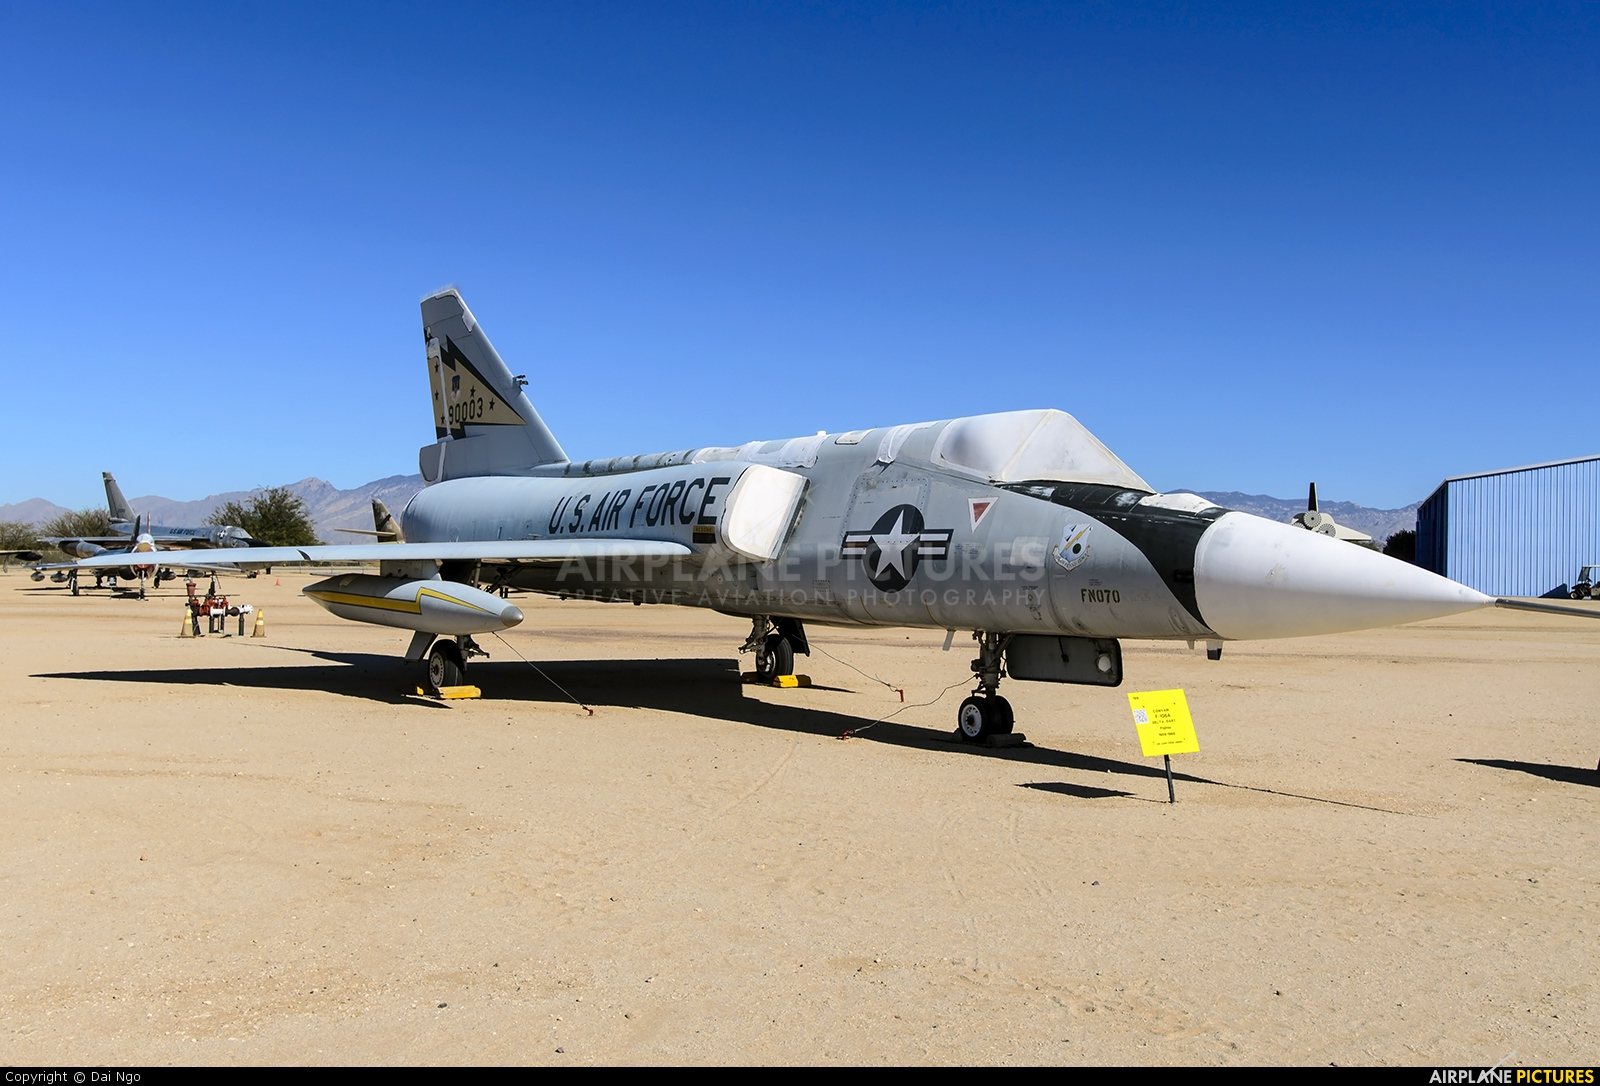 USA - Air Force 59-0003 aircraft at Tucson - Pima Air & Space Museum